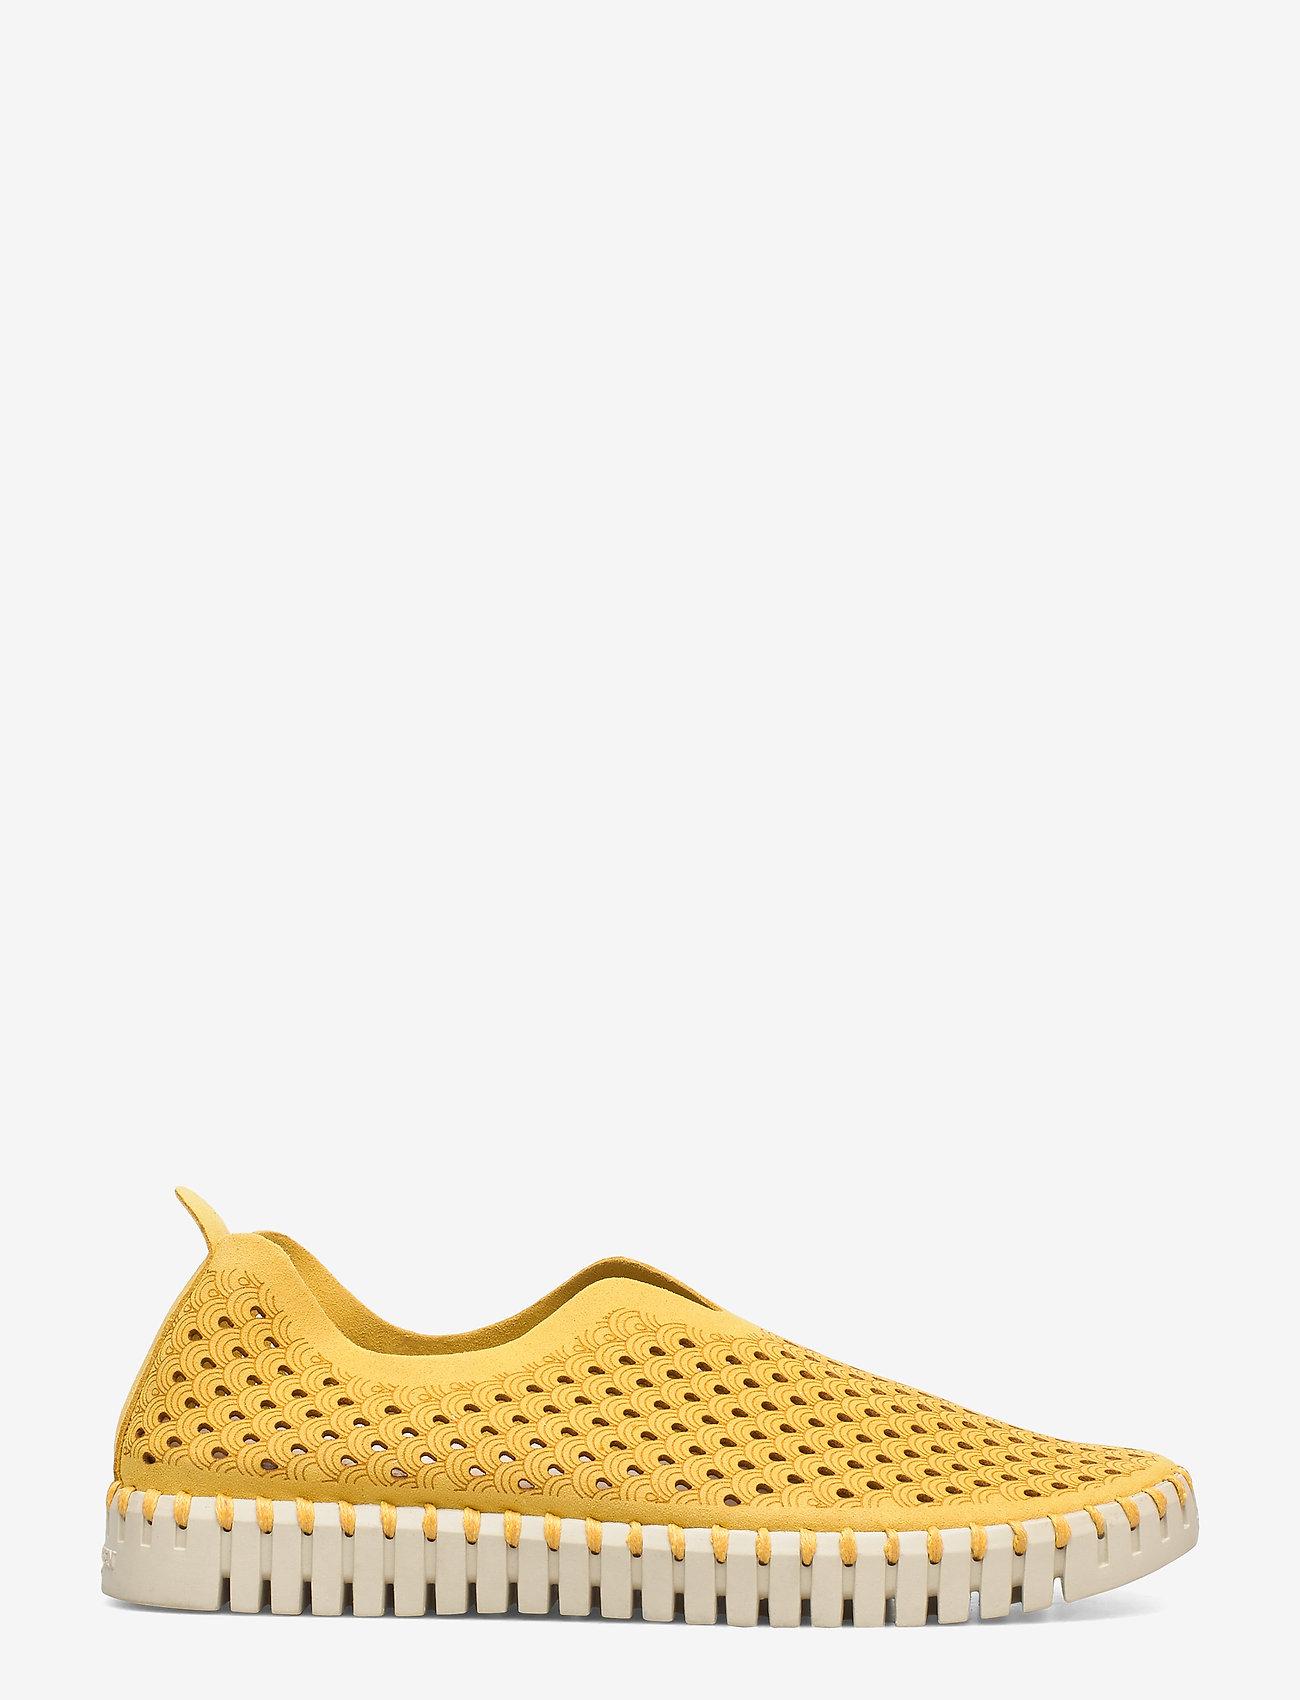 Ilse Jacobsen - Flats - slip-on sneakers - golden rod - 1